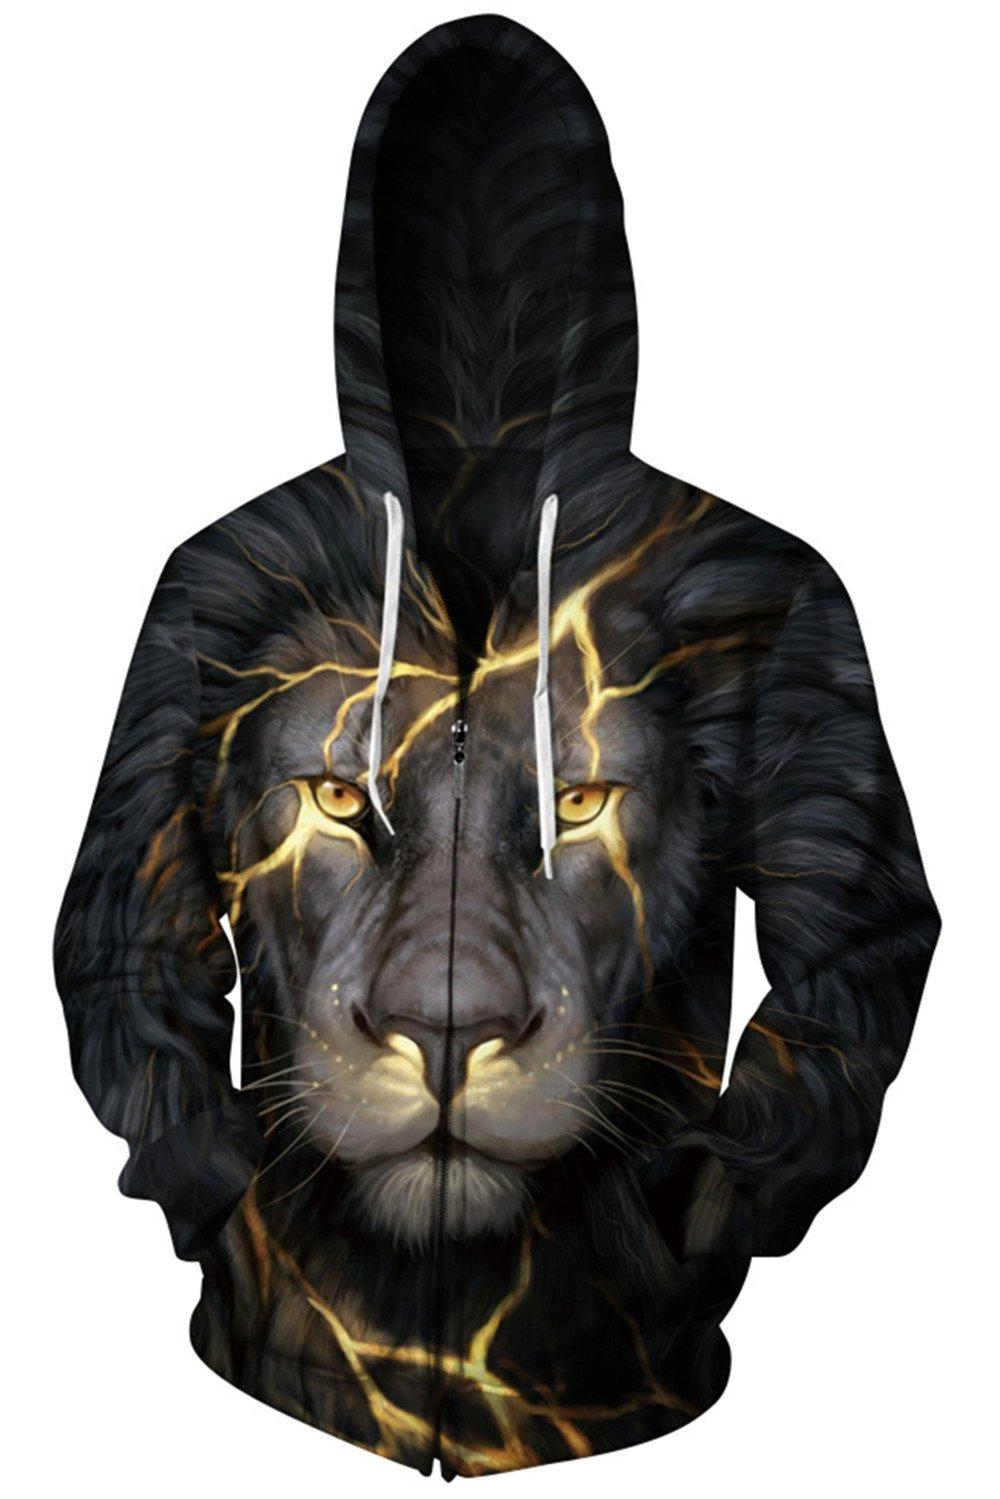 EnlaChic Unisex Realistic 3D All Over Print Zip up Hoodie Jacket Hooded Sweatshirt,Lightning Lion,L/XL by EnlaChic